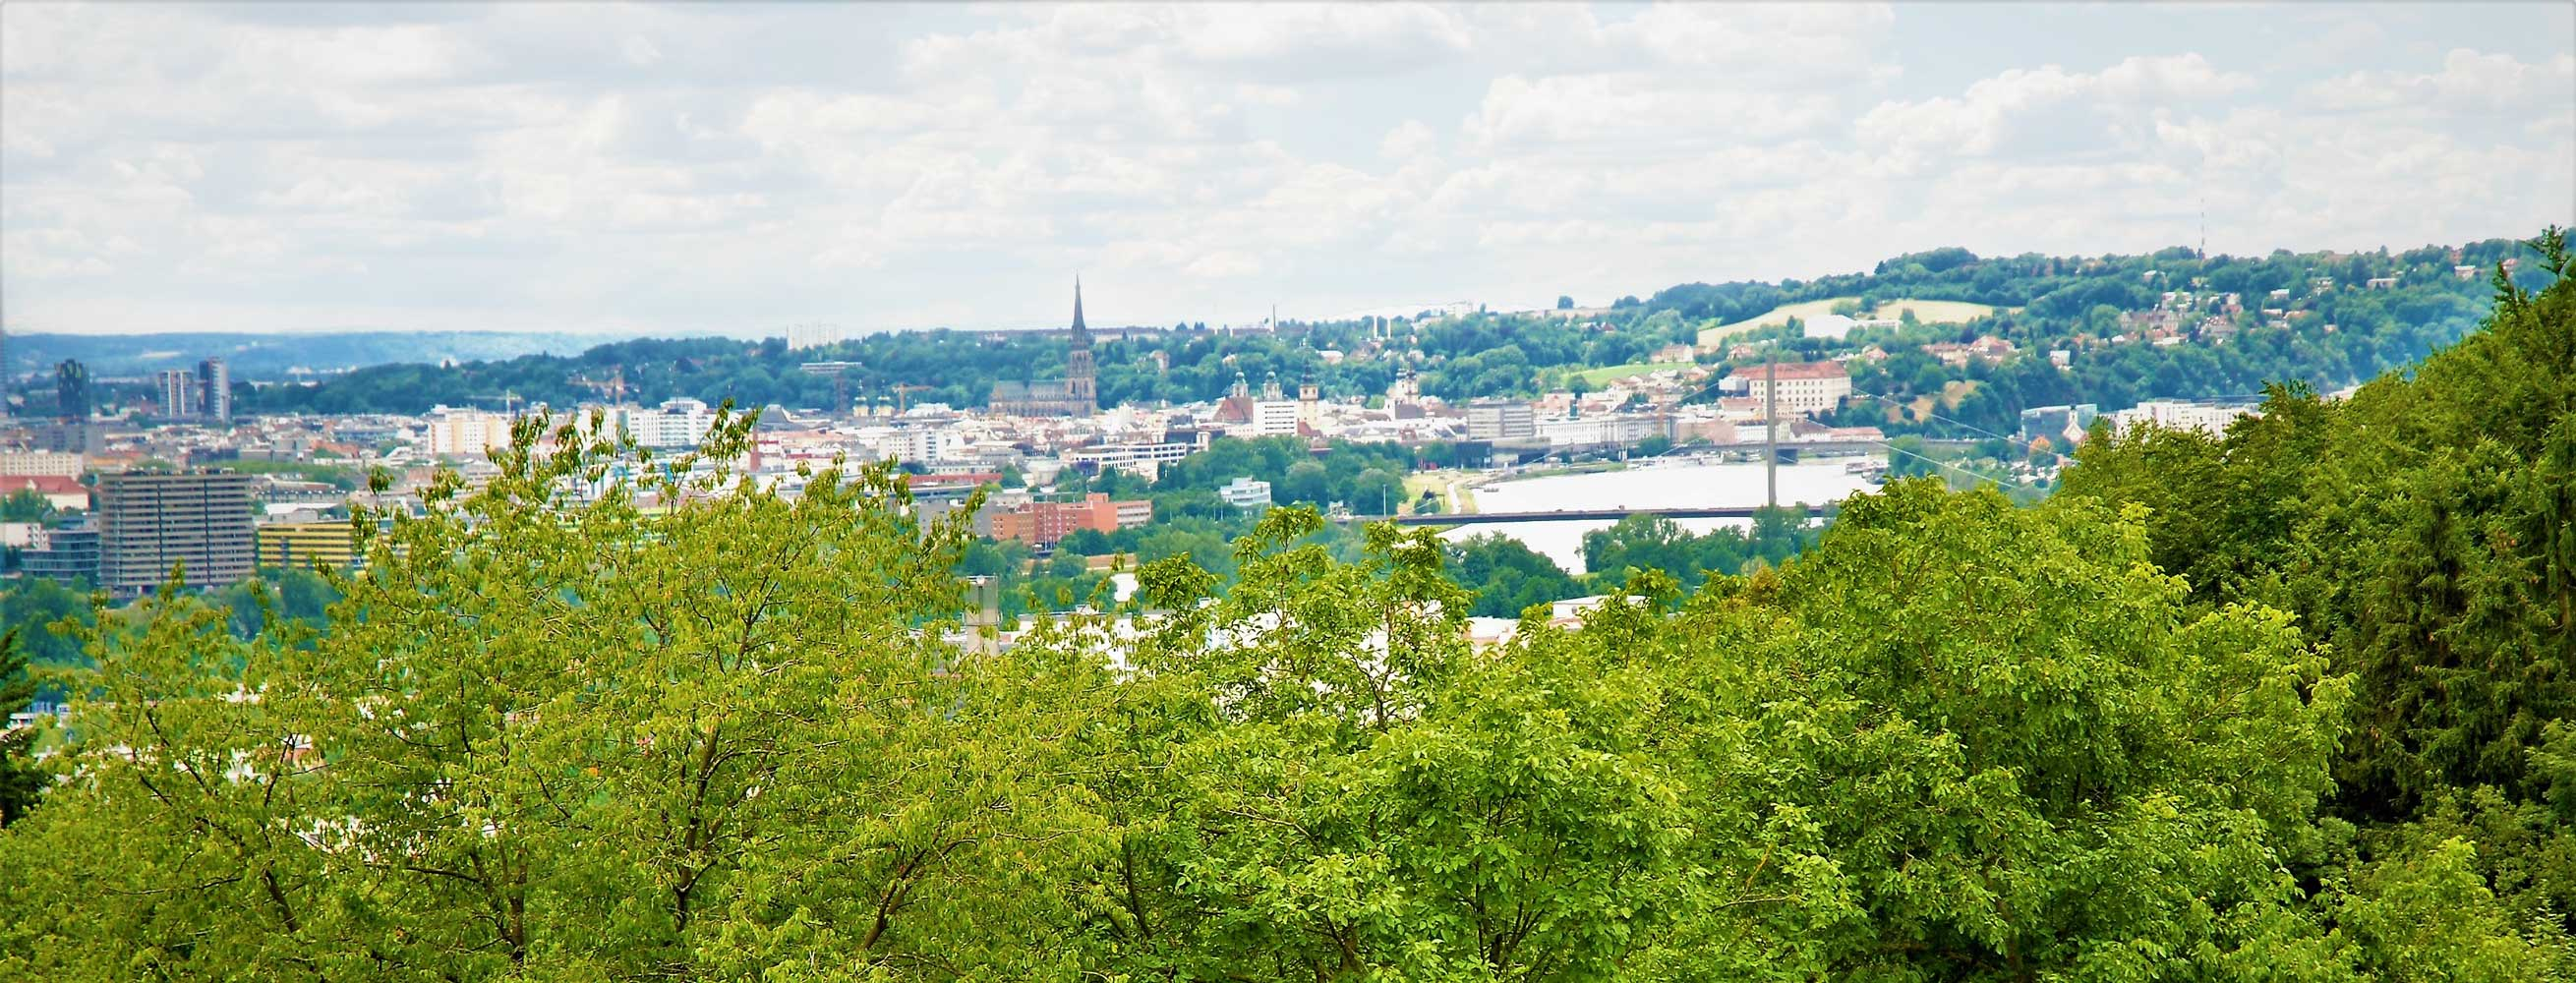 Linz Umgebung